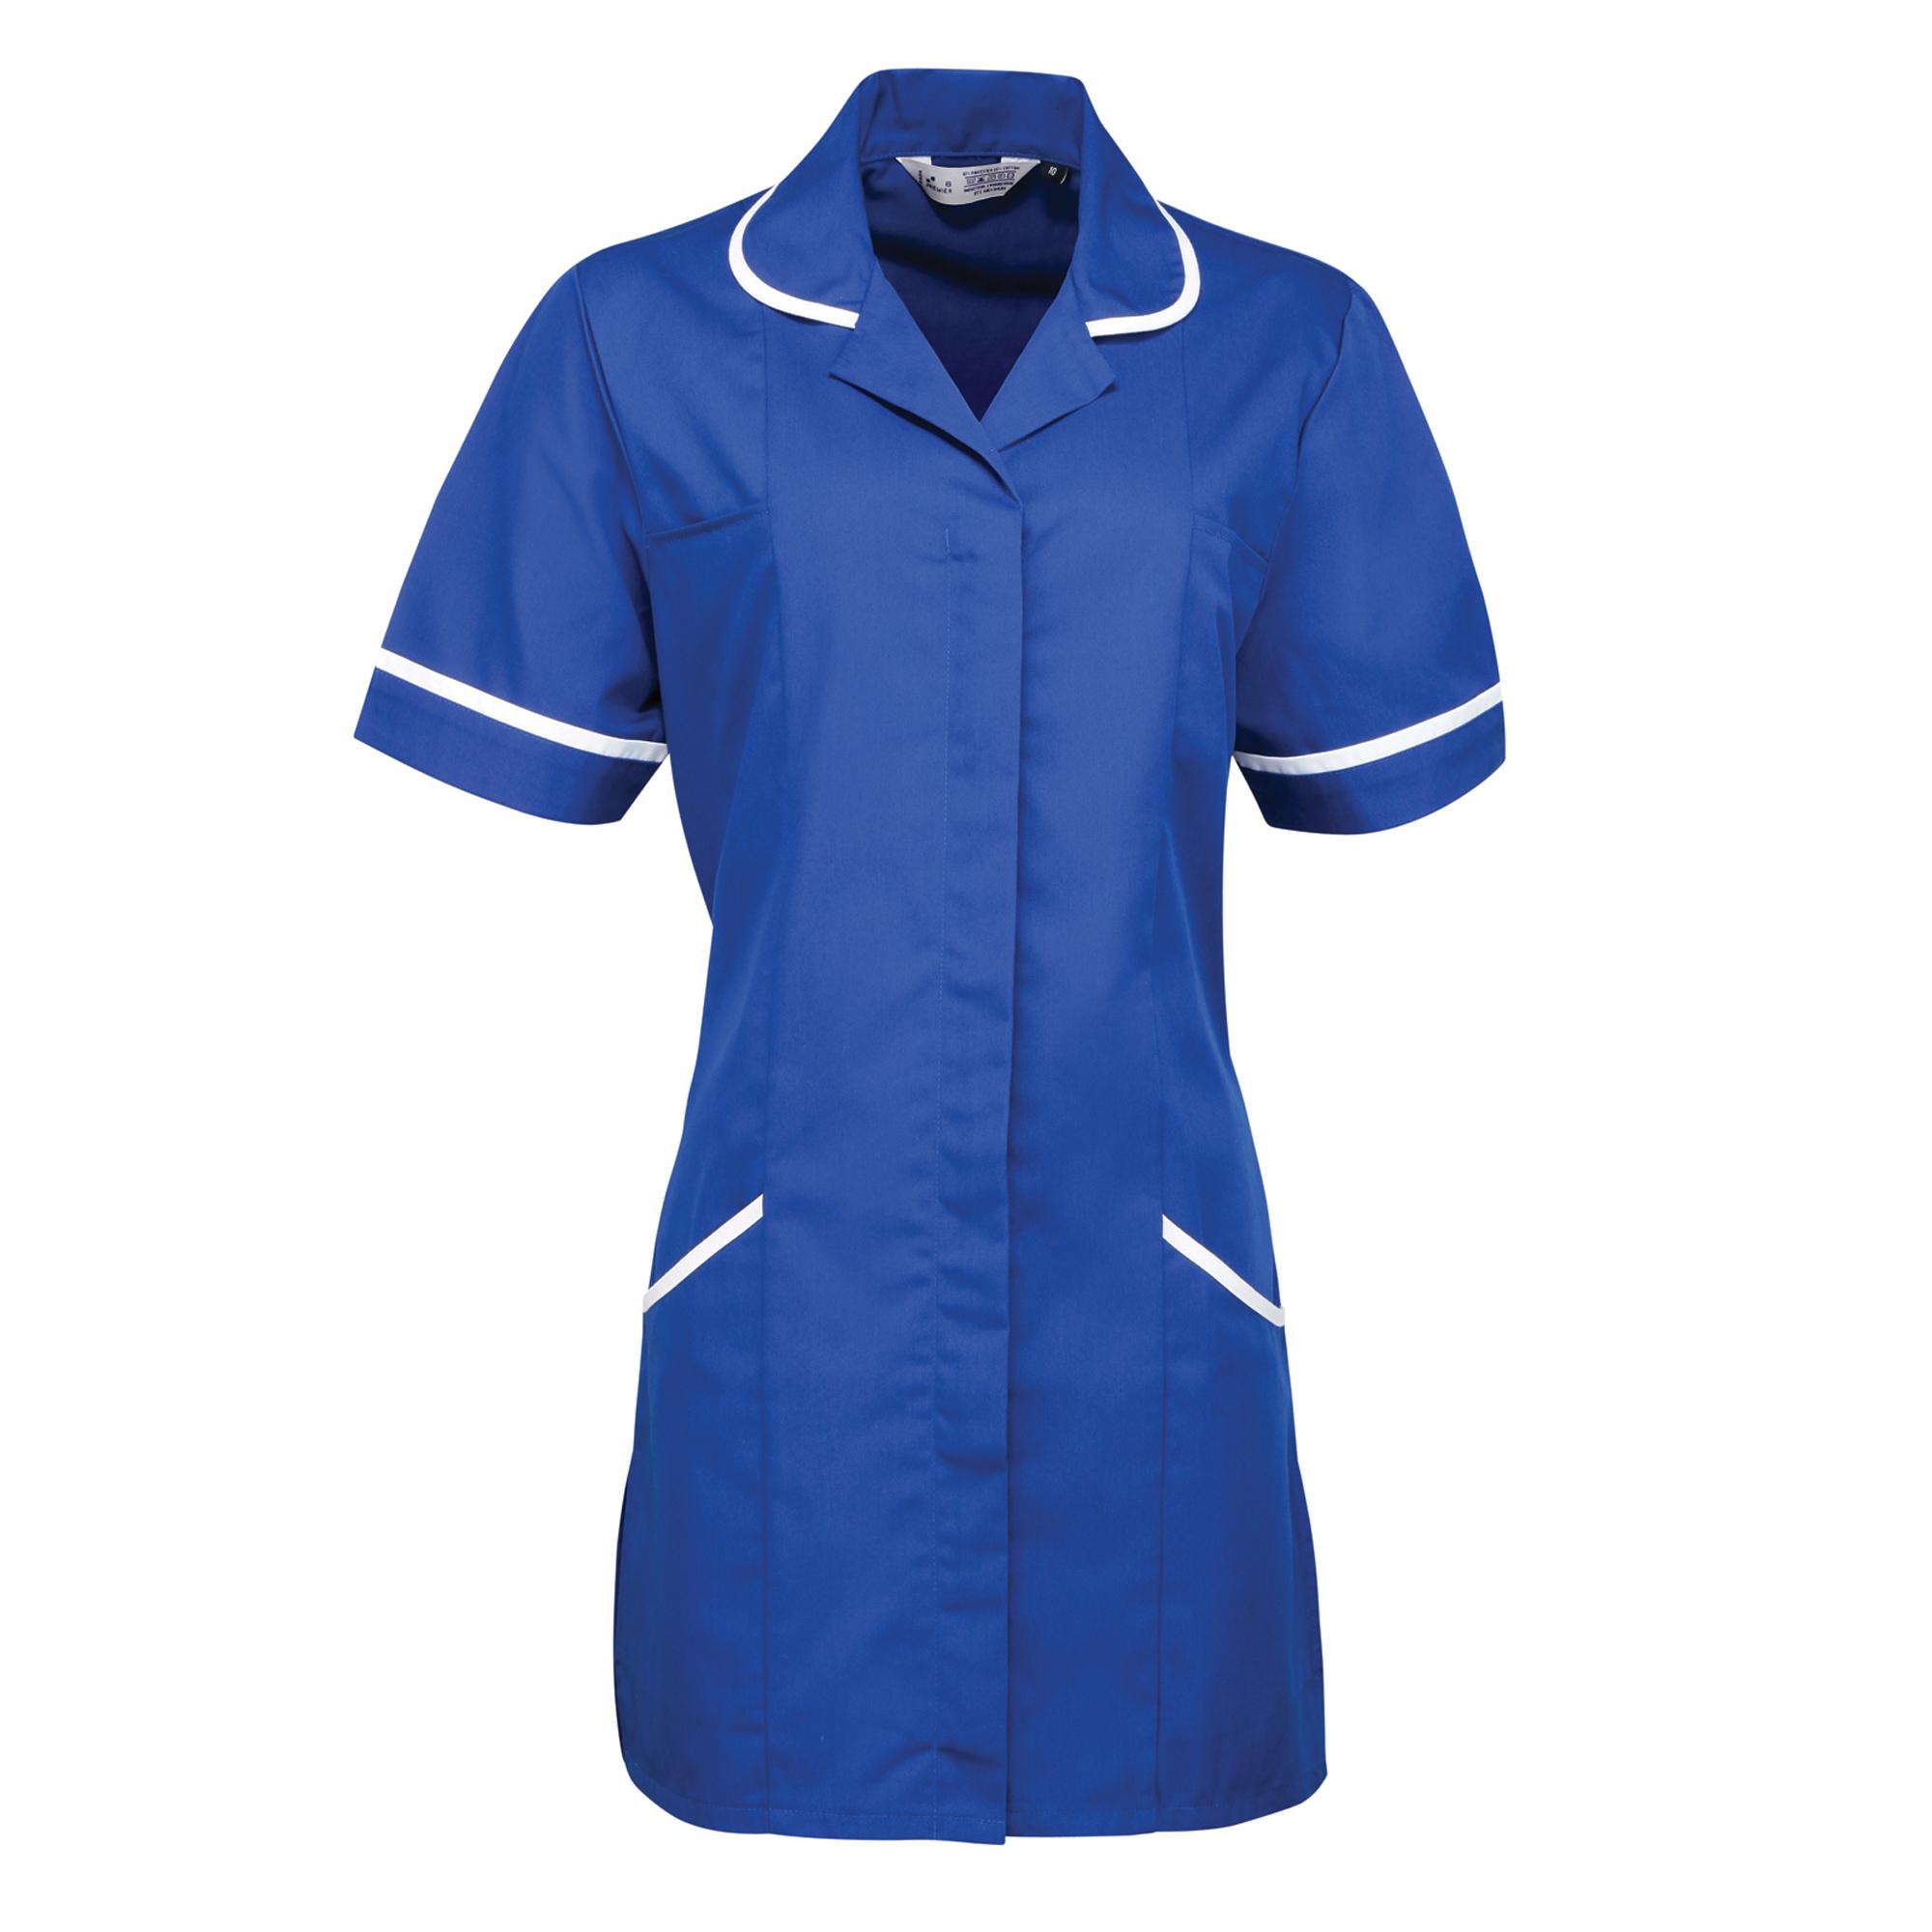 Premier Ladies/Womens Vitality Medical/Healthcare Work Tunic (8) (Royal/ White)